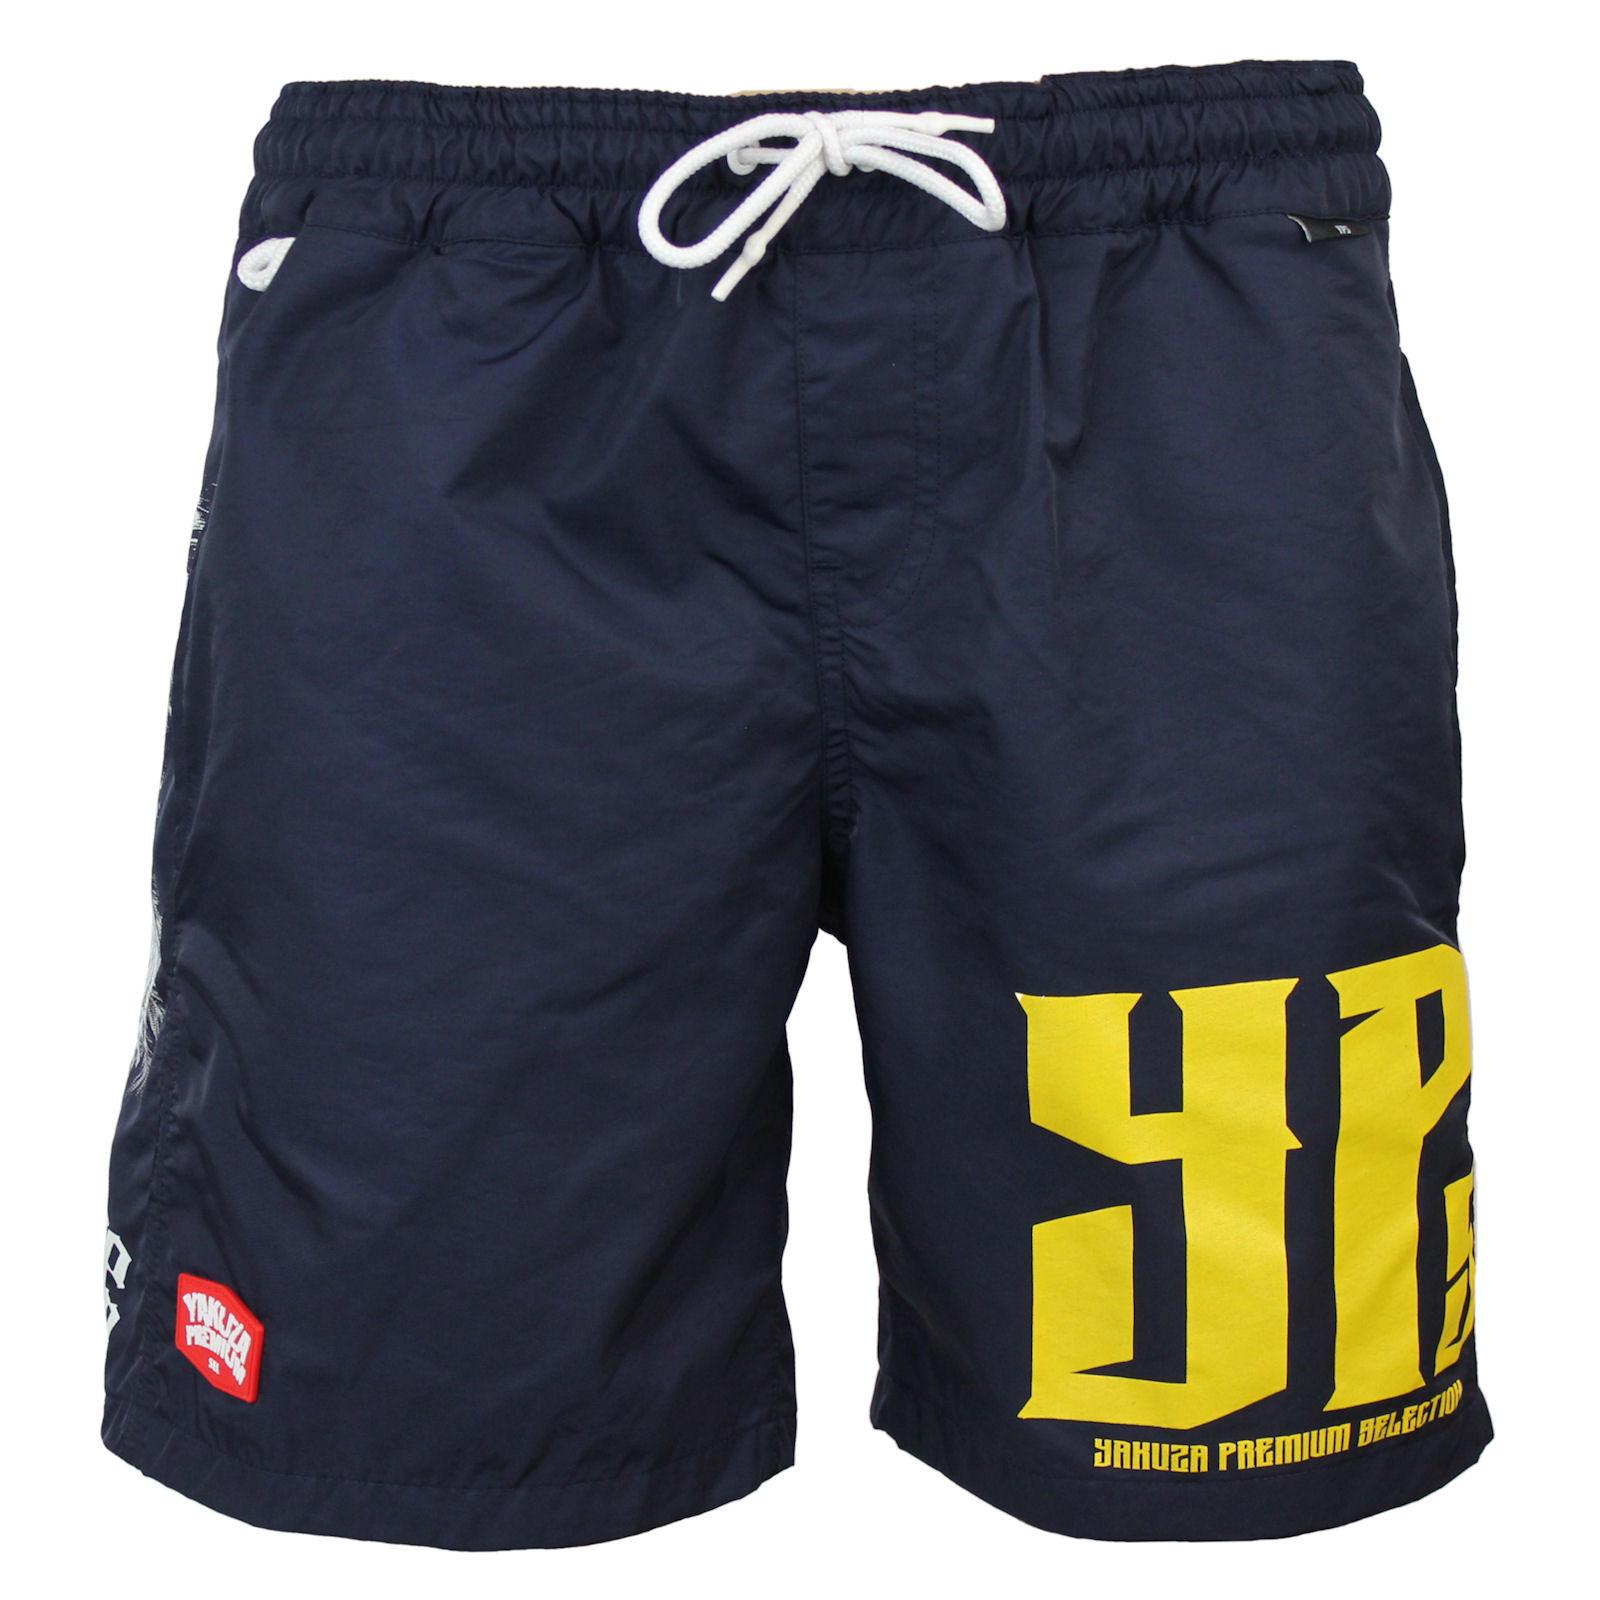 d180194c48 Yakuza Premium men swimming trunks YPWS 2780 navy blue SPECIALS MEN ...